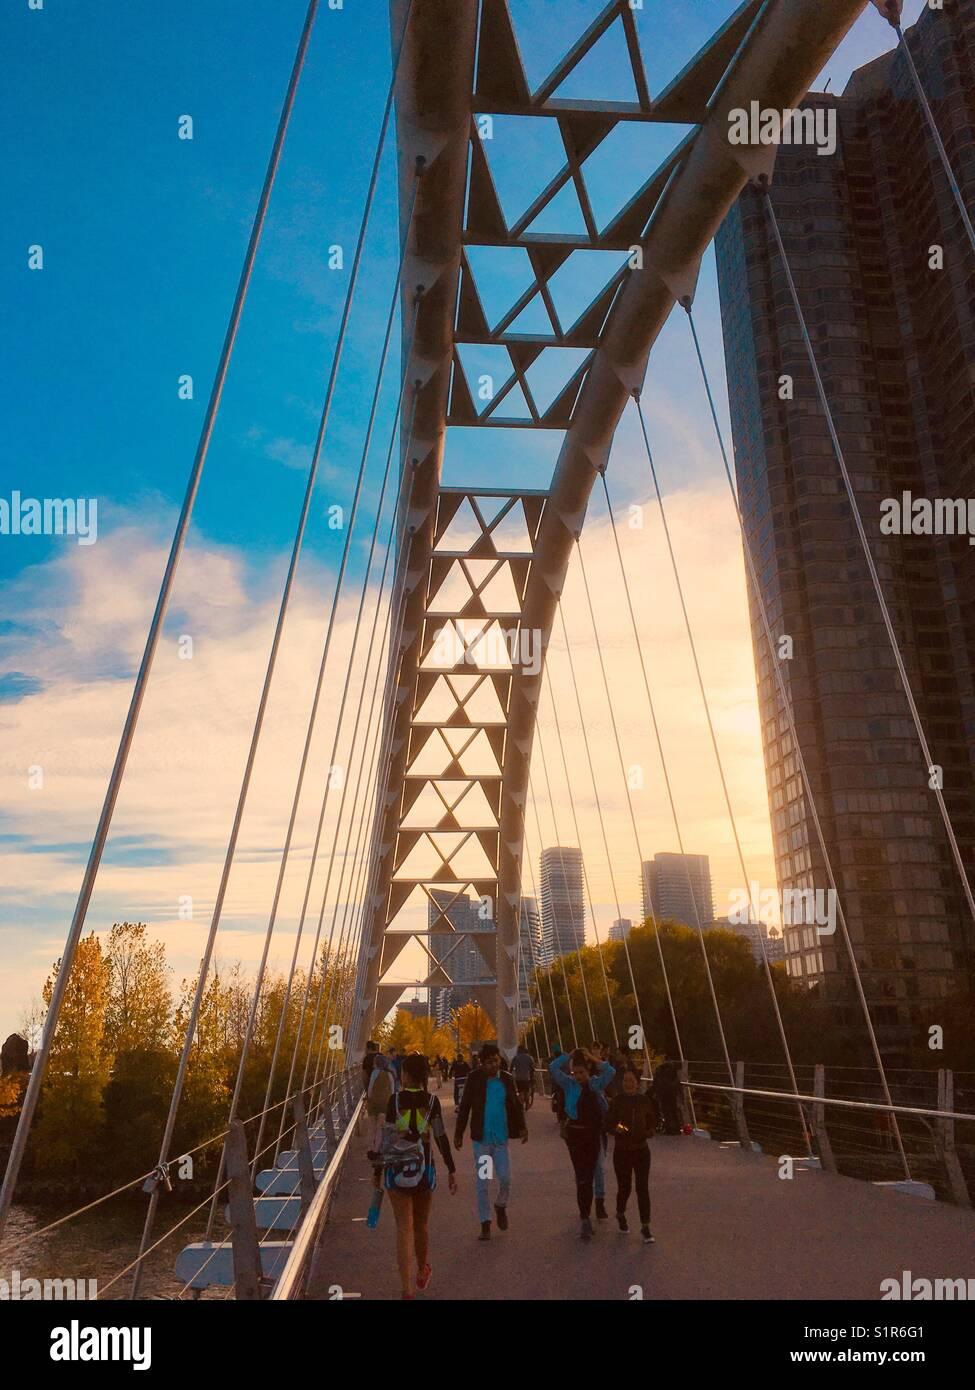 Humber Bay Arch Bridge, Toronto, Canada. - Stock Image